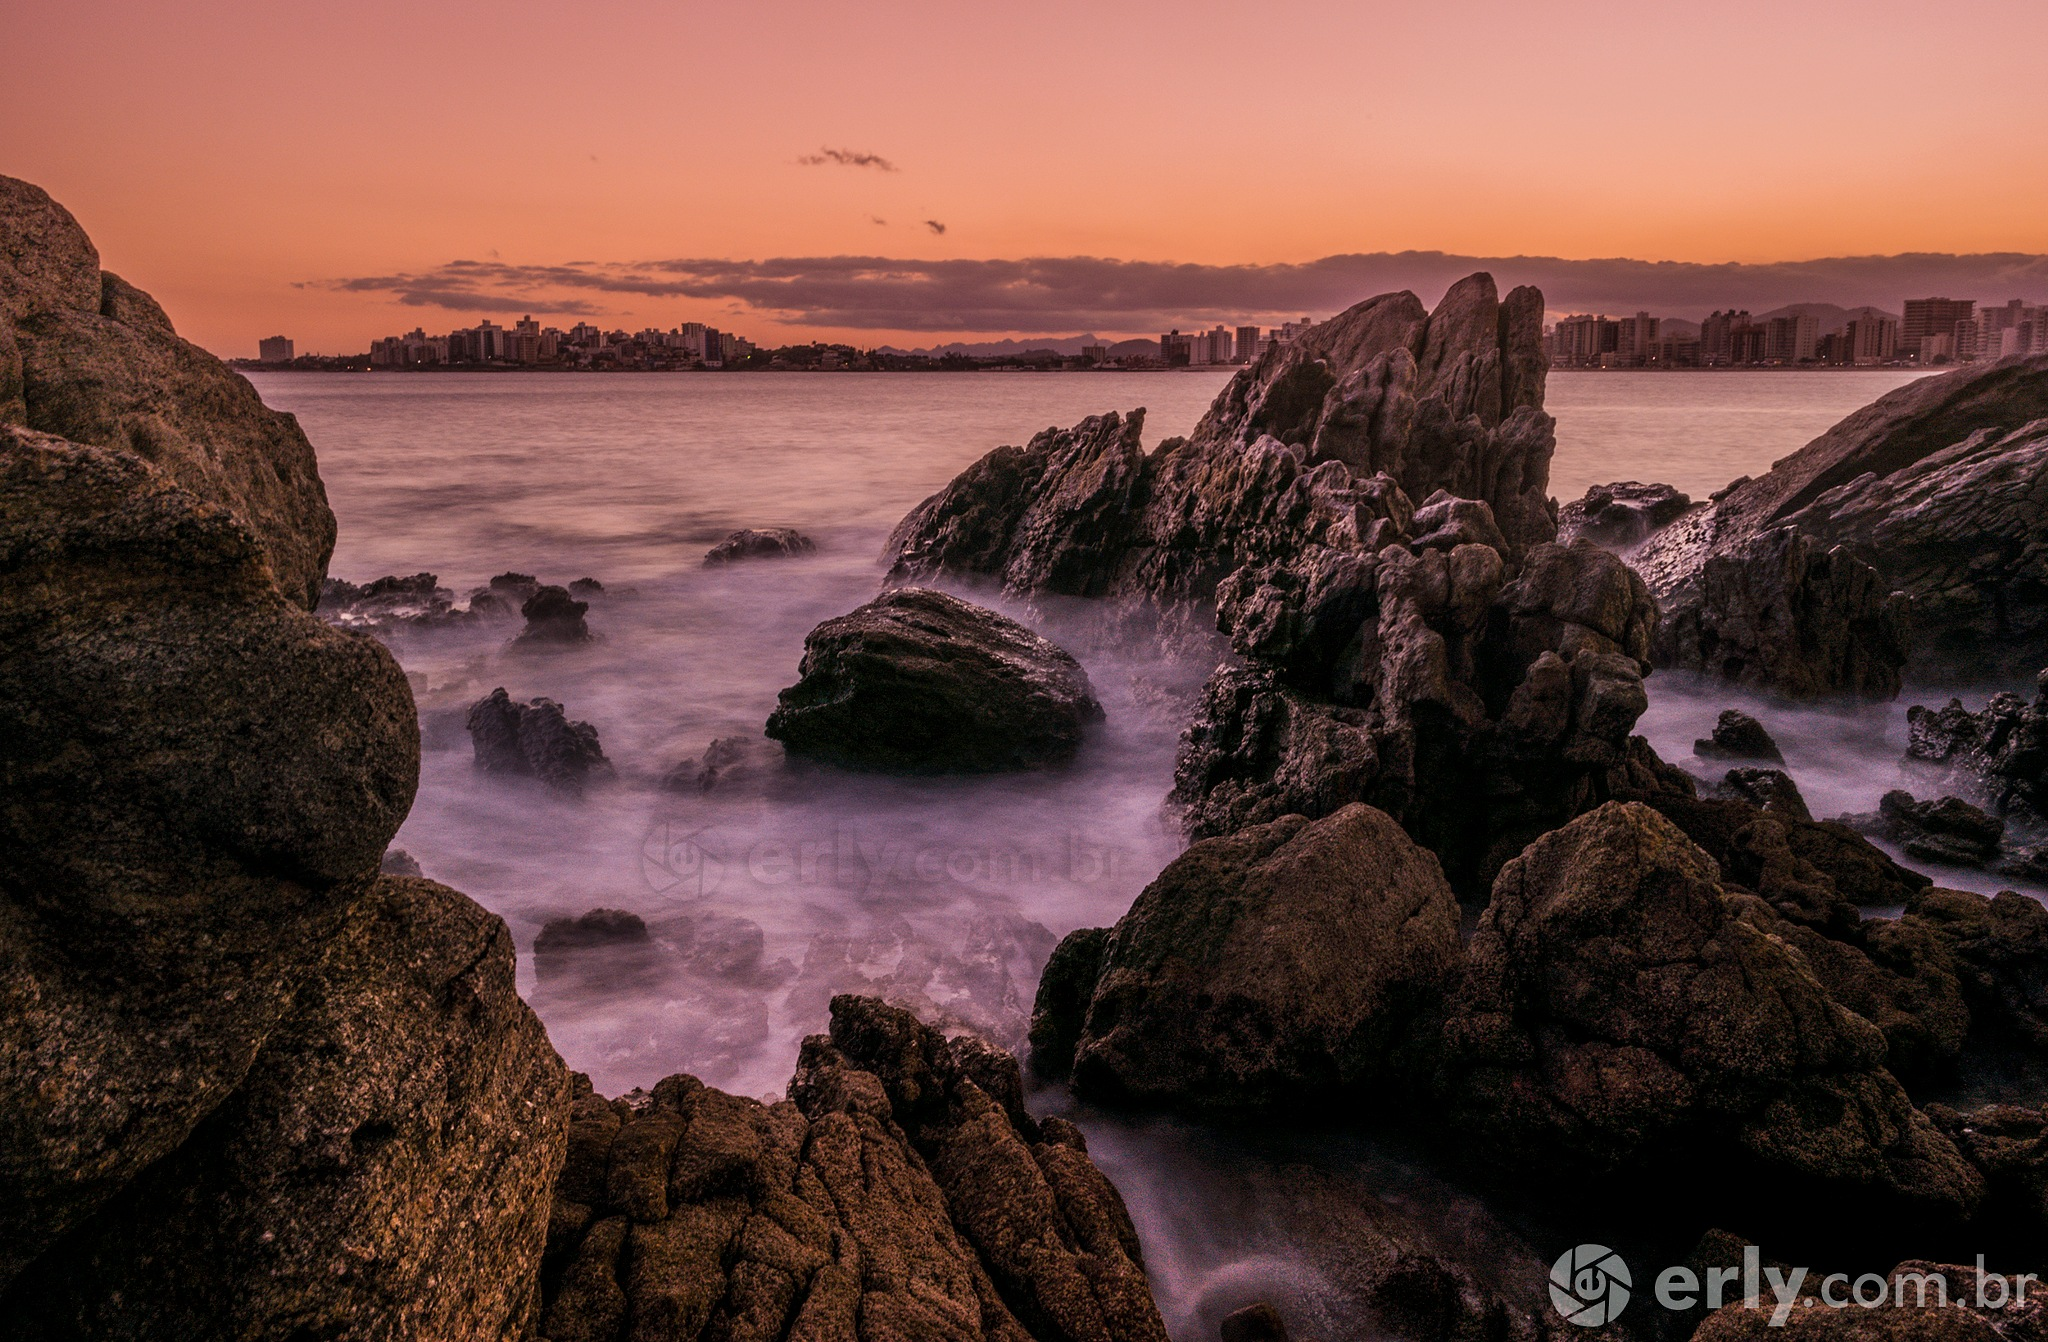 Praia do Morro - Guarapari/ES by Erly Nunes Machado